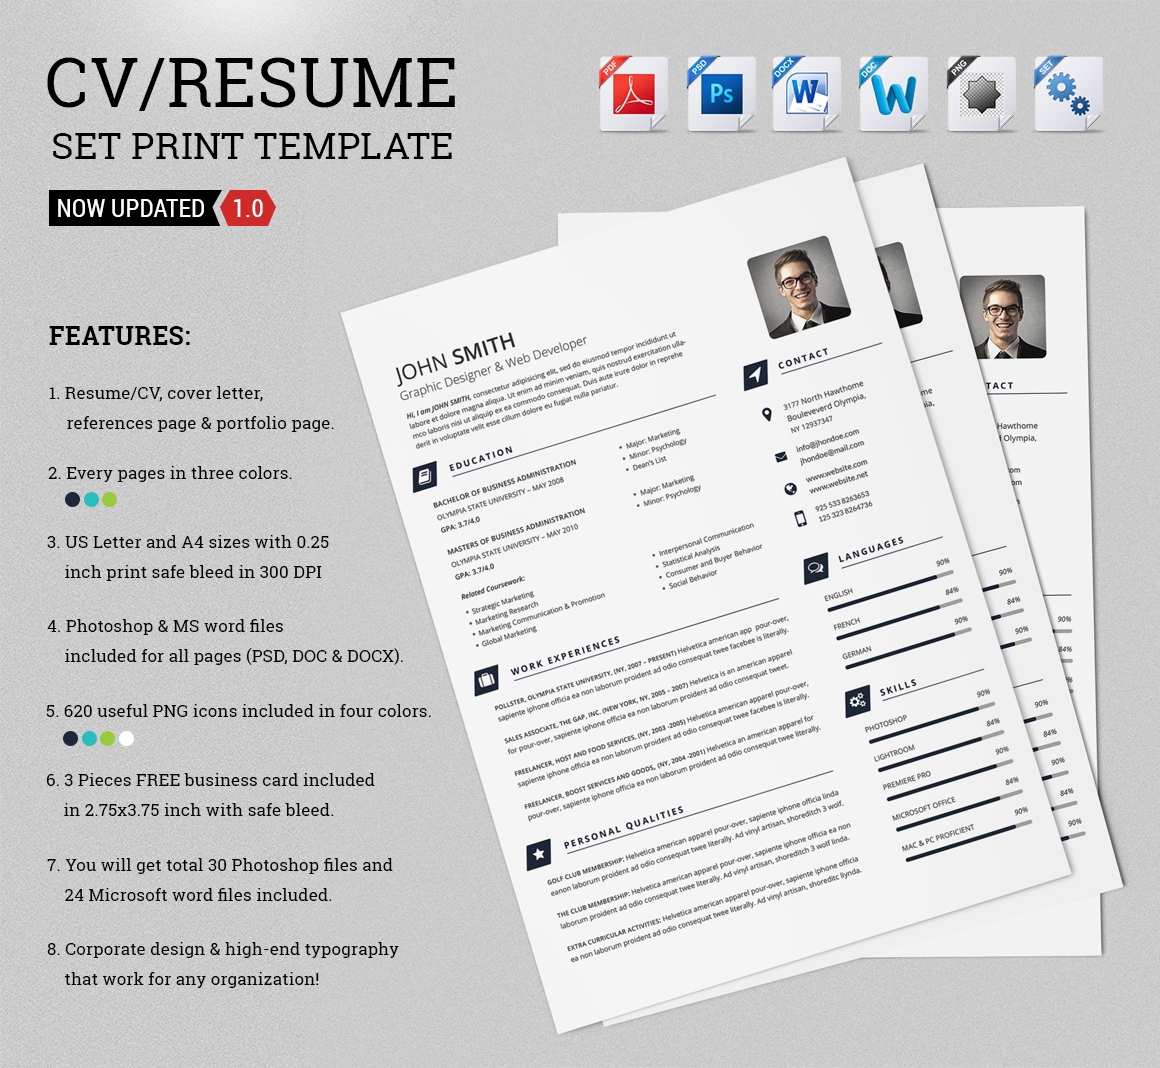 CV Resume Set Print Template Resume Templates on Creative Market